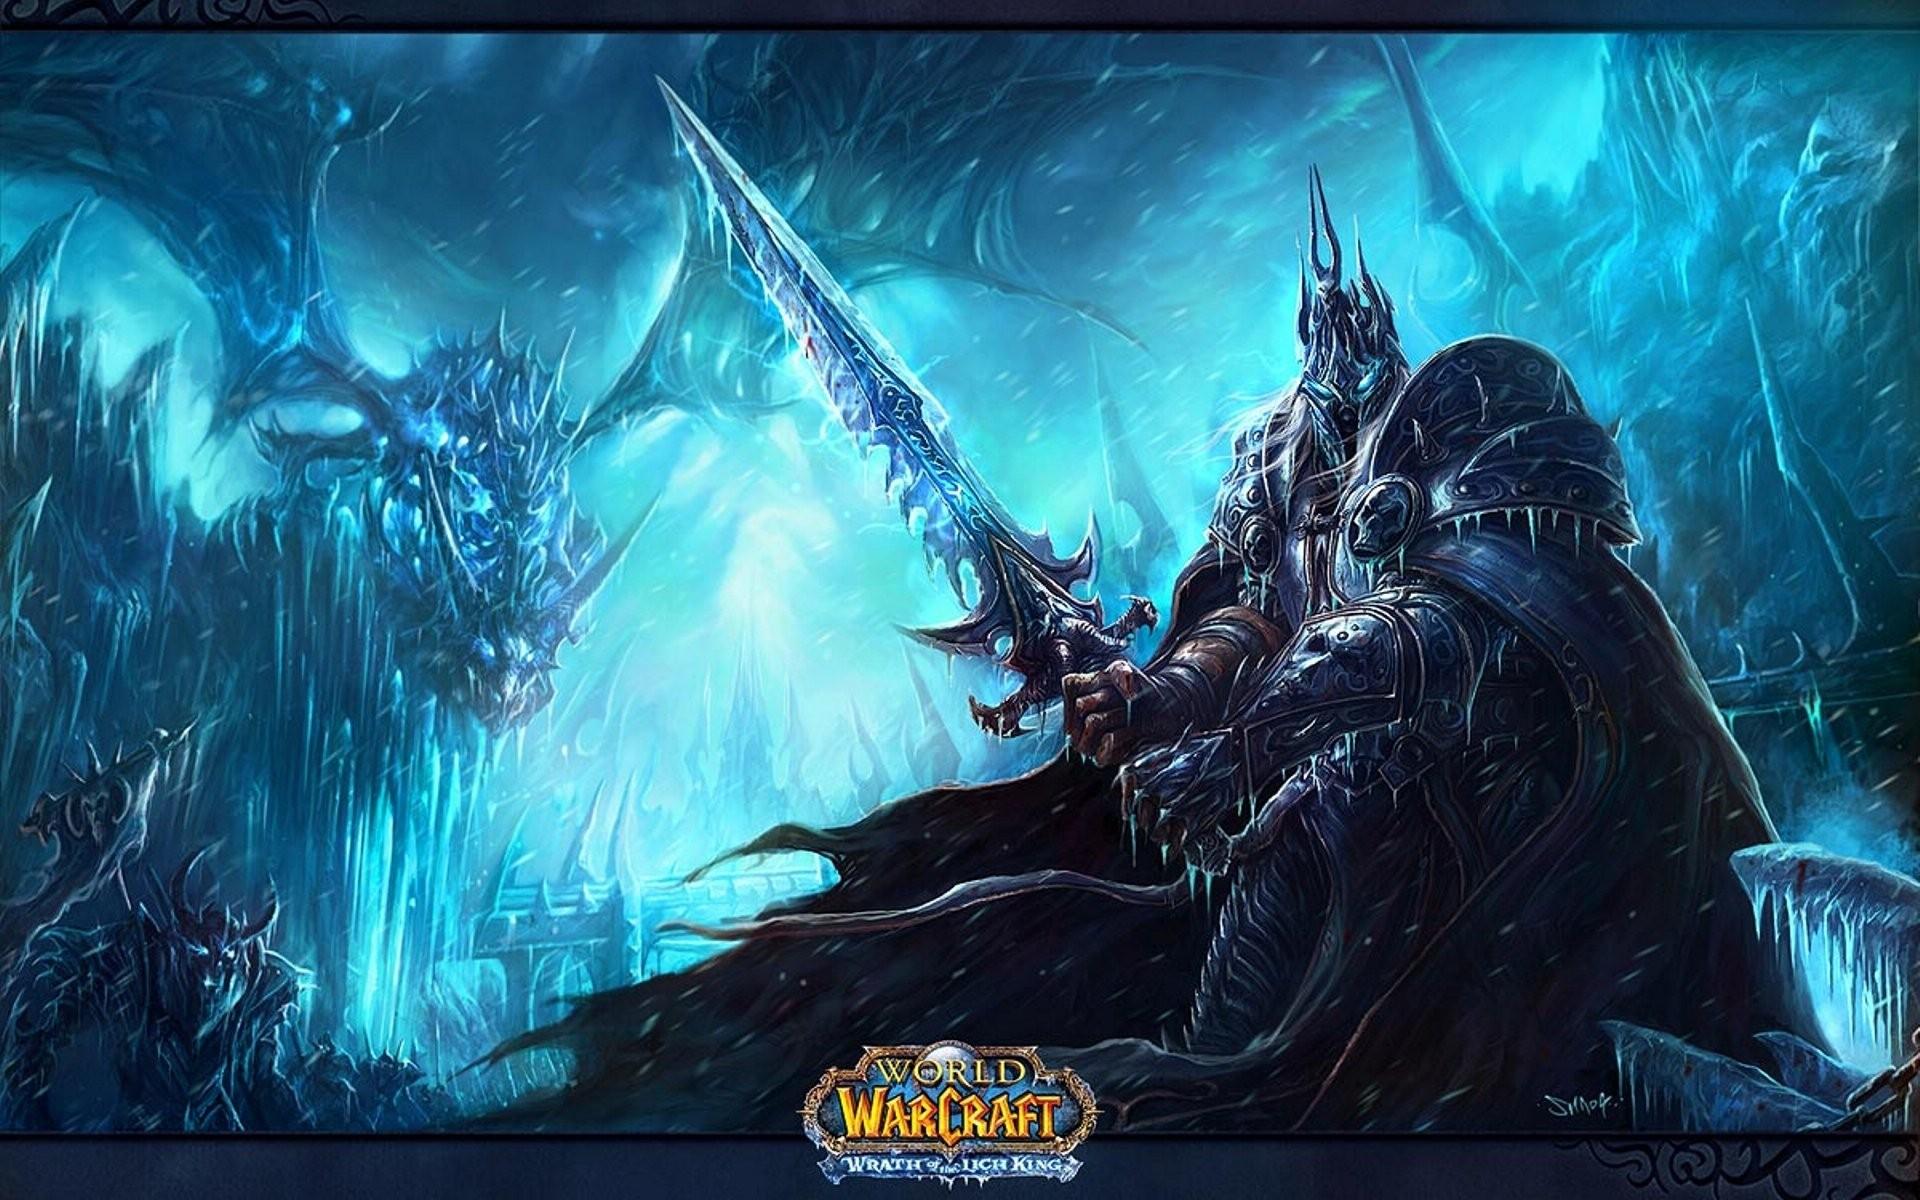 1920x1200 World Of Warcraft Wallpaper